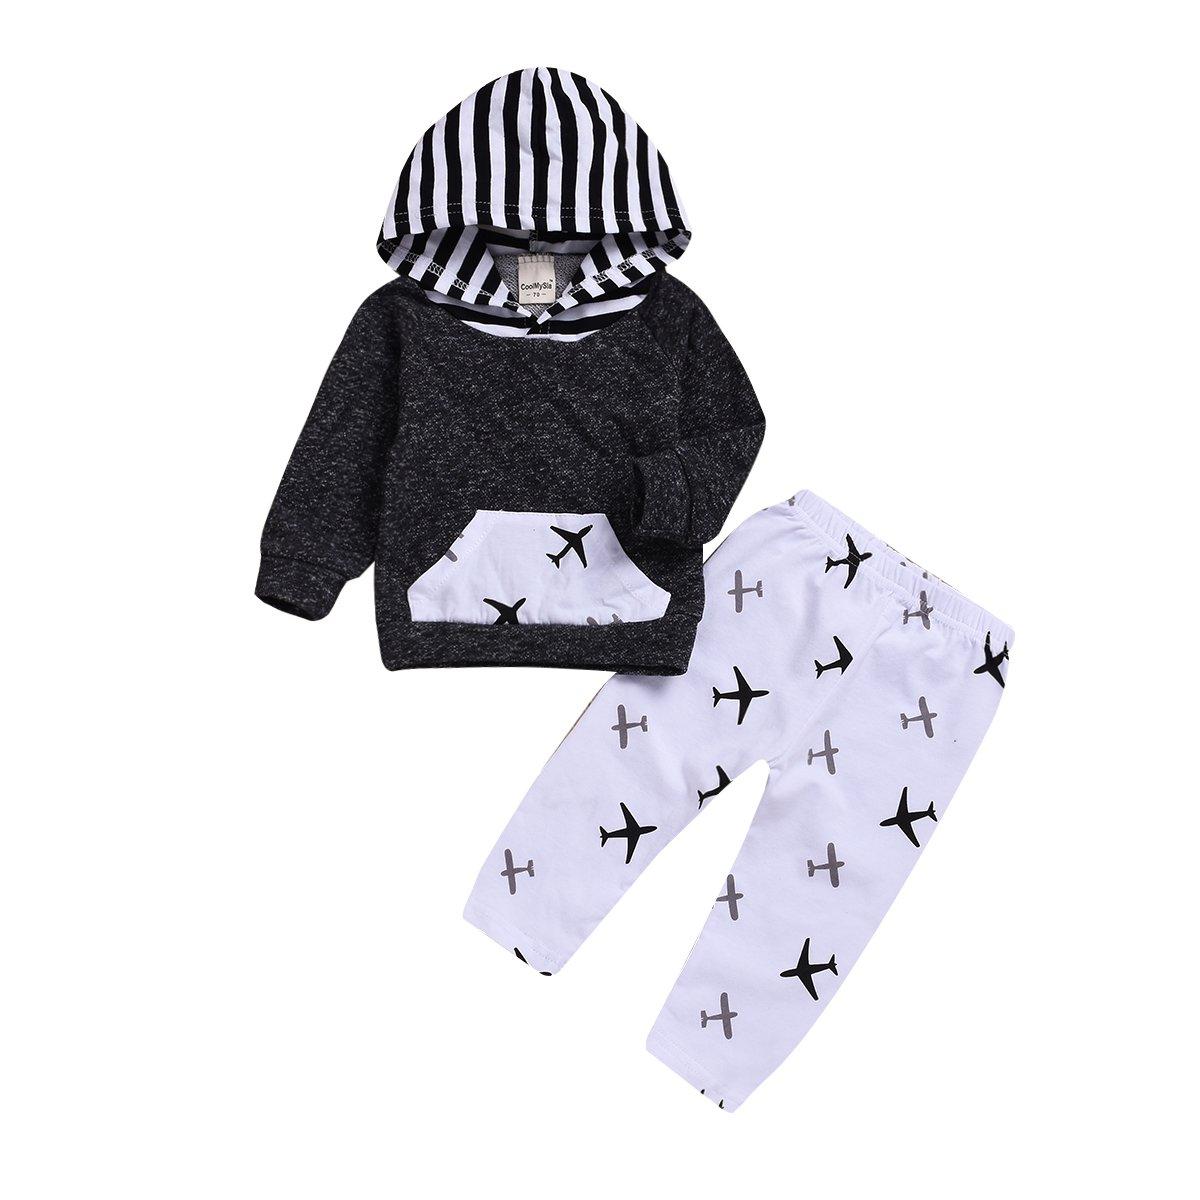 Amazon.com: XiaoReddou - Conjunto de sudadera con capucha ...